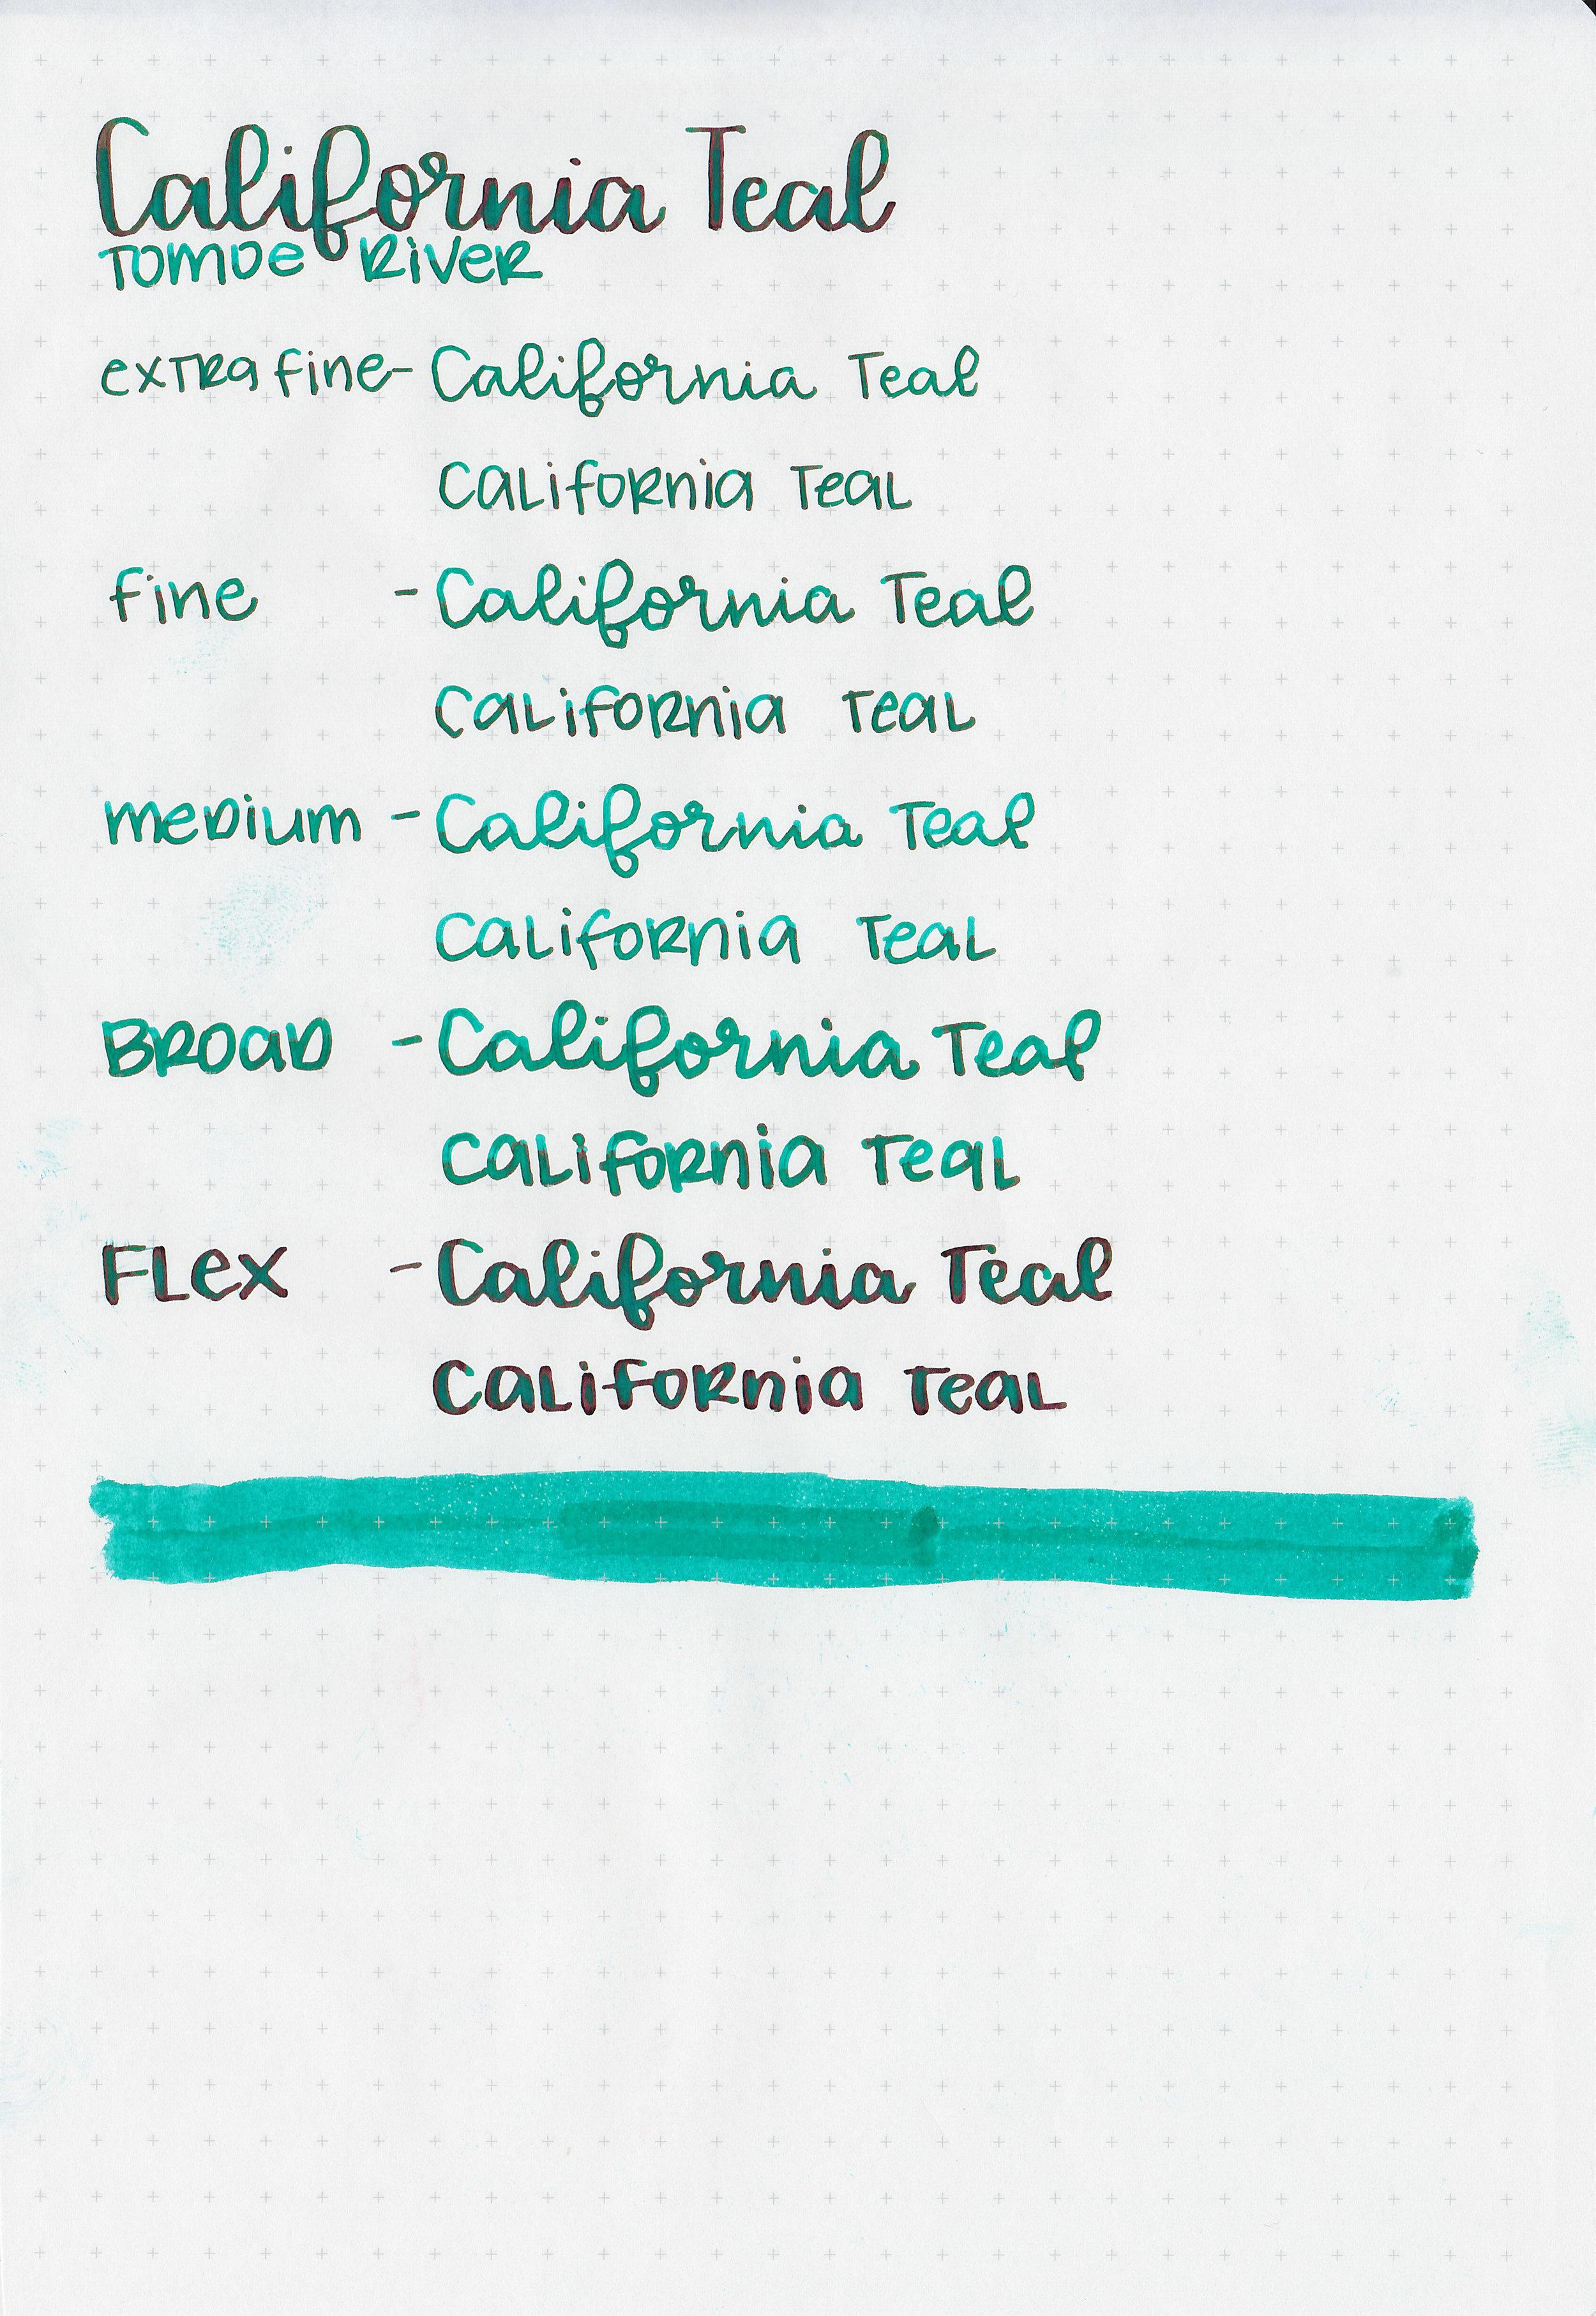 mv-california-teal-7.jpg